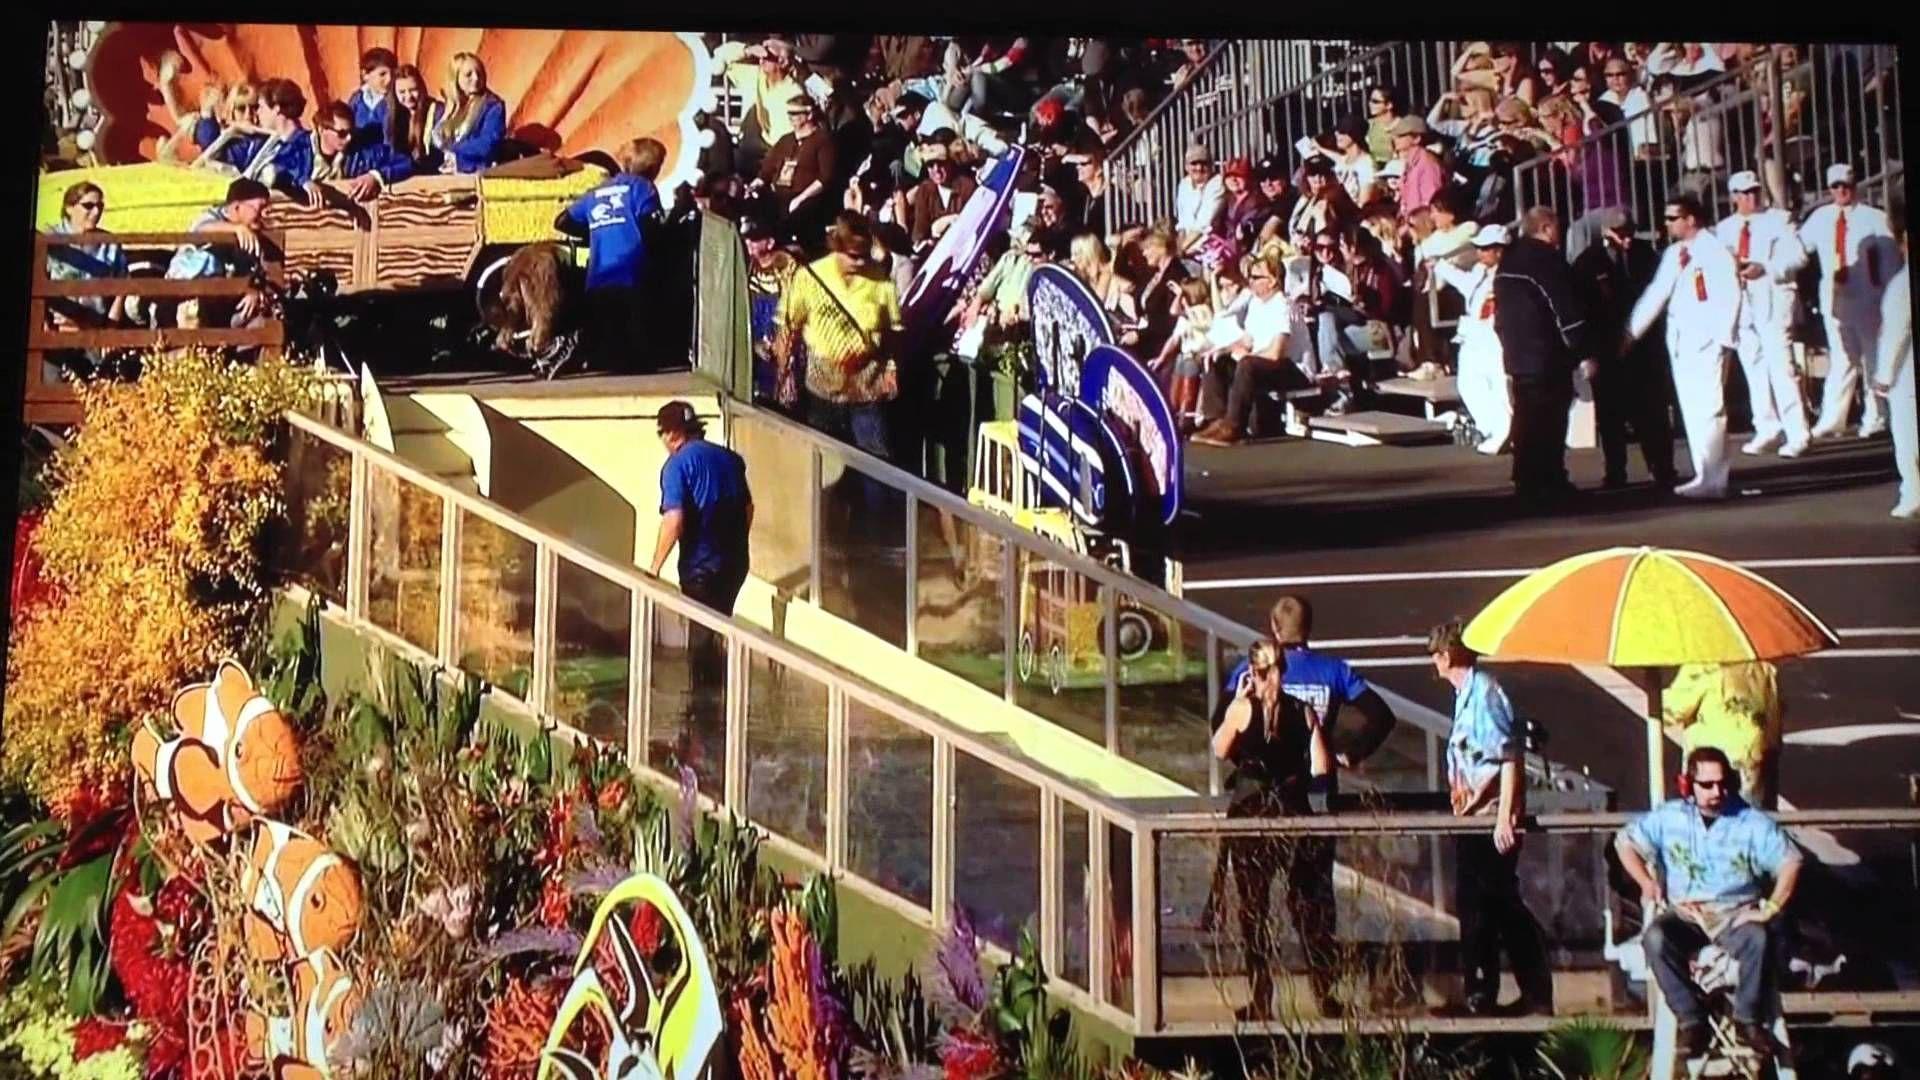 Surfing Dog Rose Bowl Parade Float With Images Rose Bowl